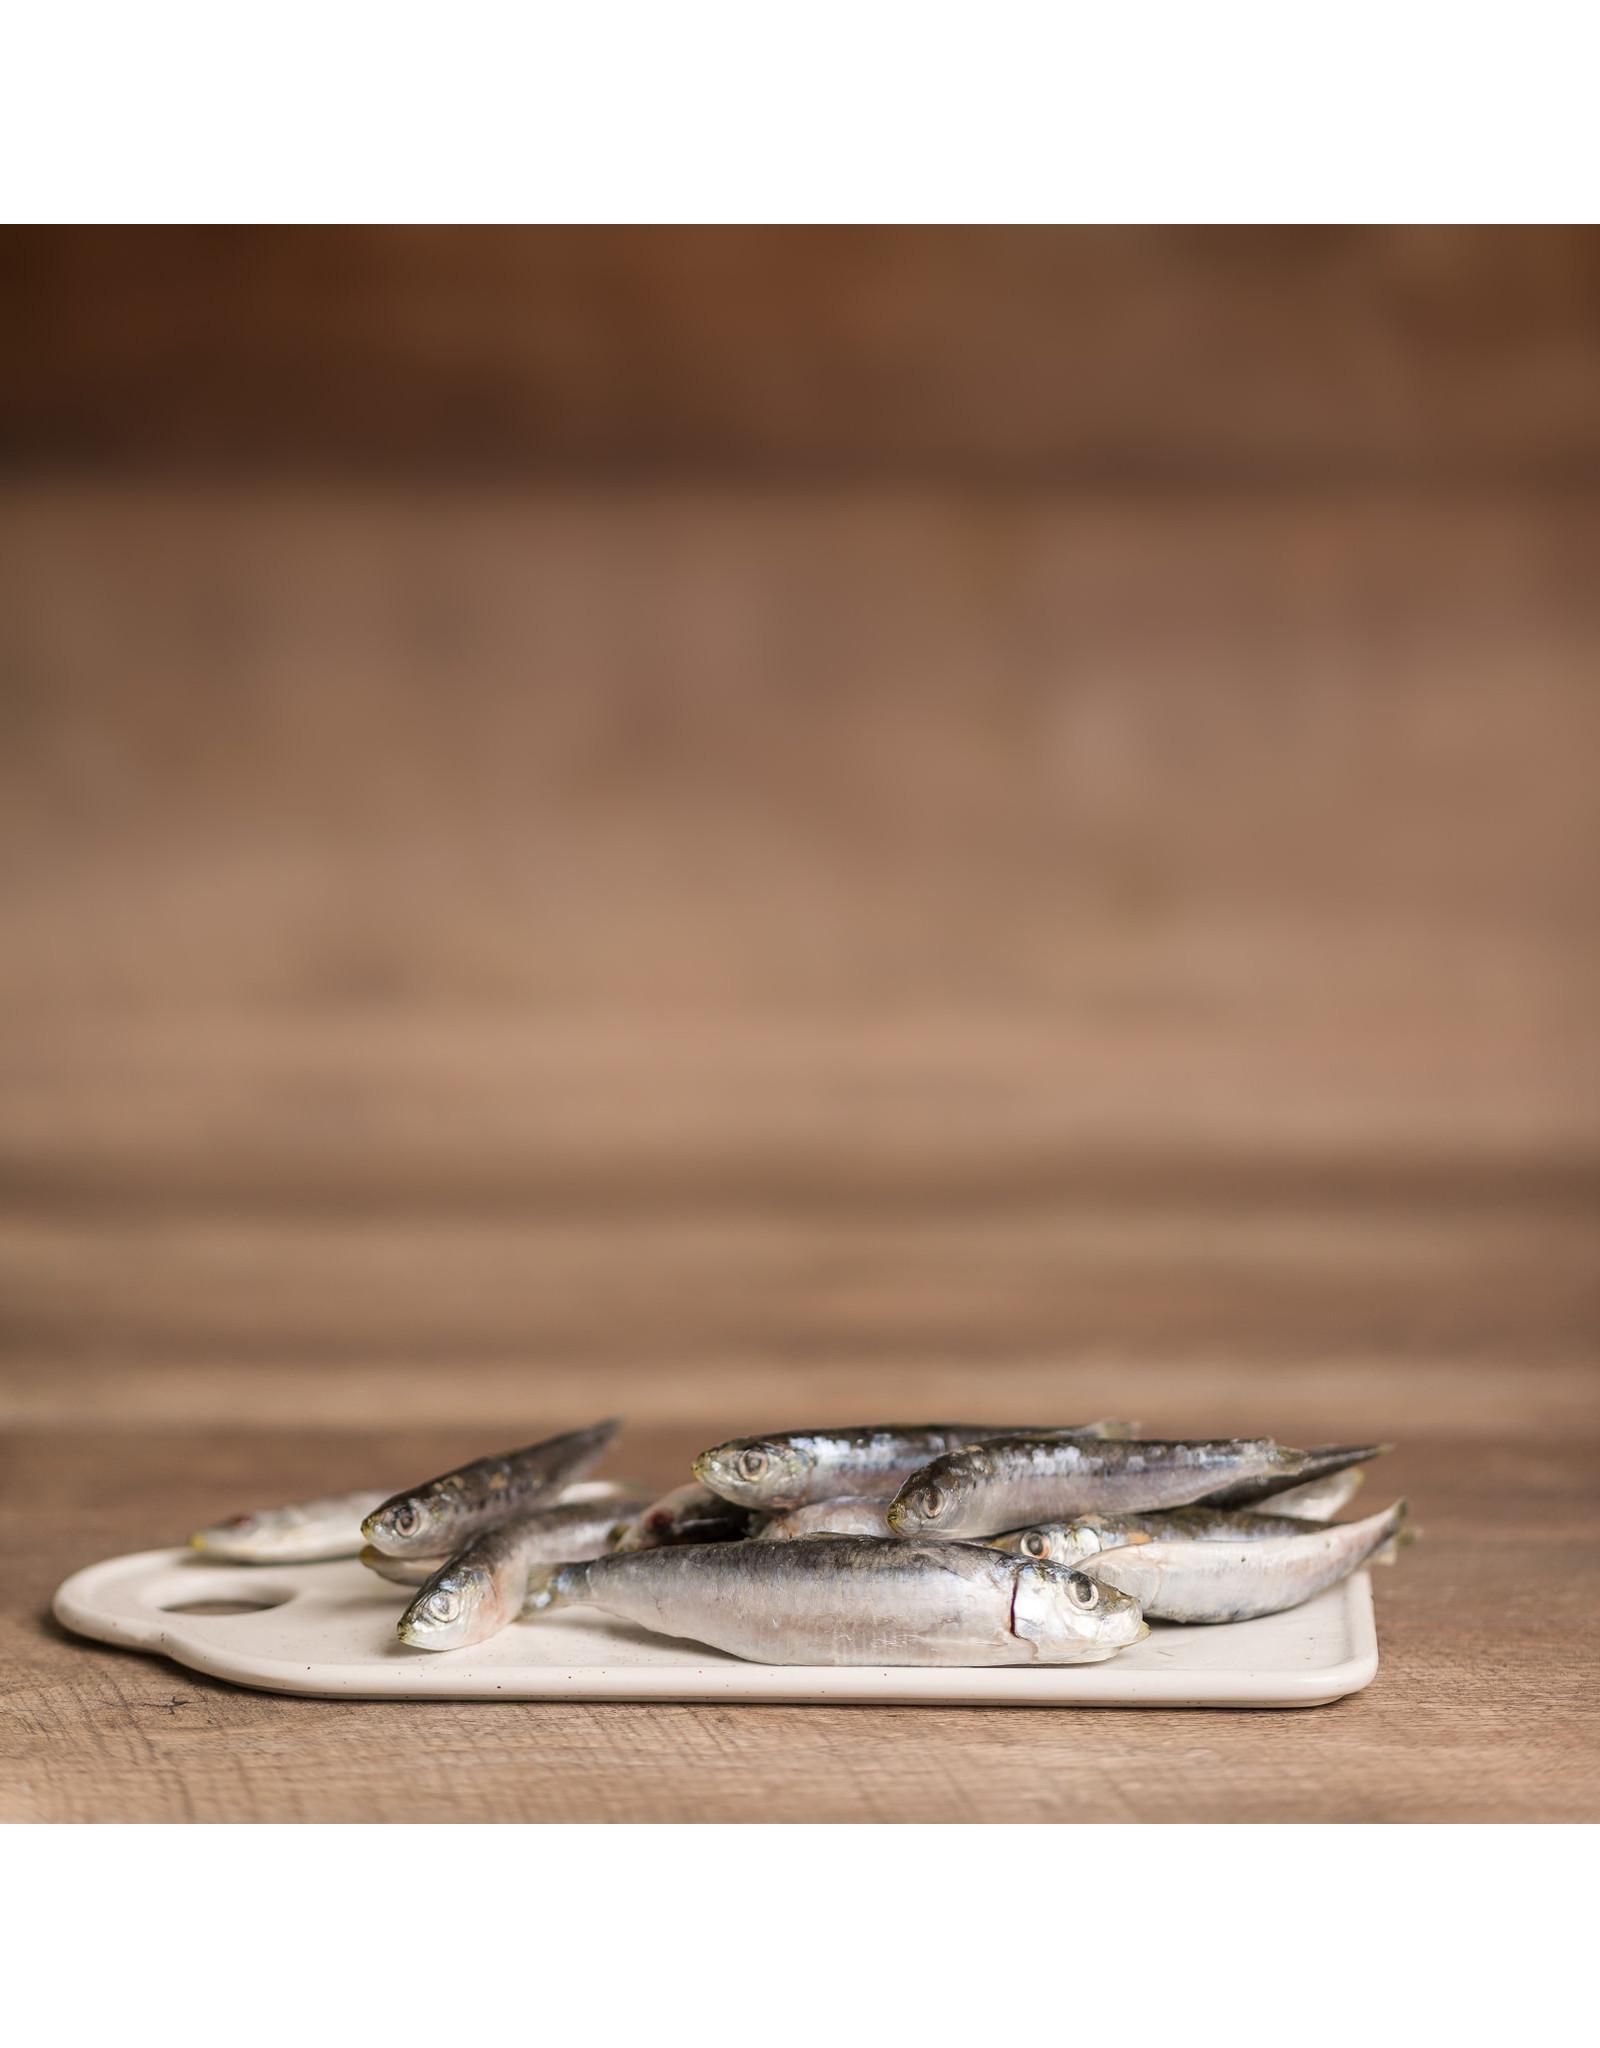 BCR BCR BONES Sardines 1lb